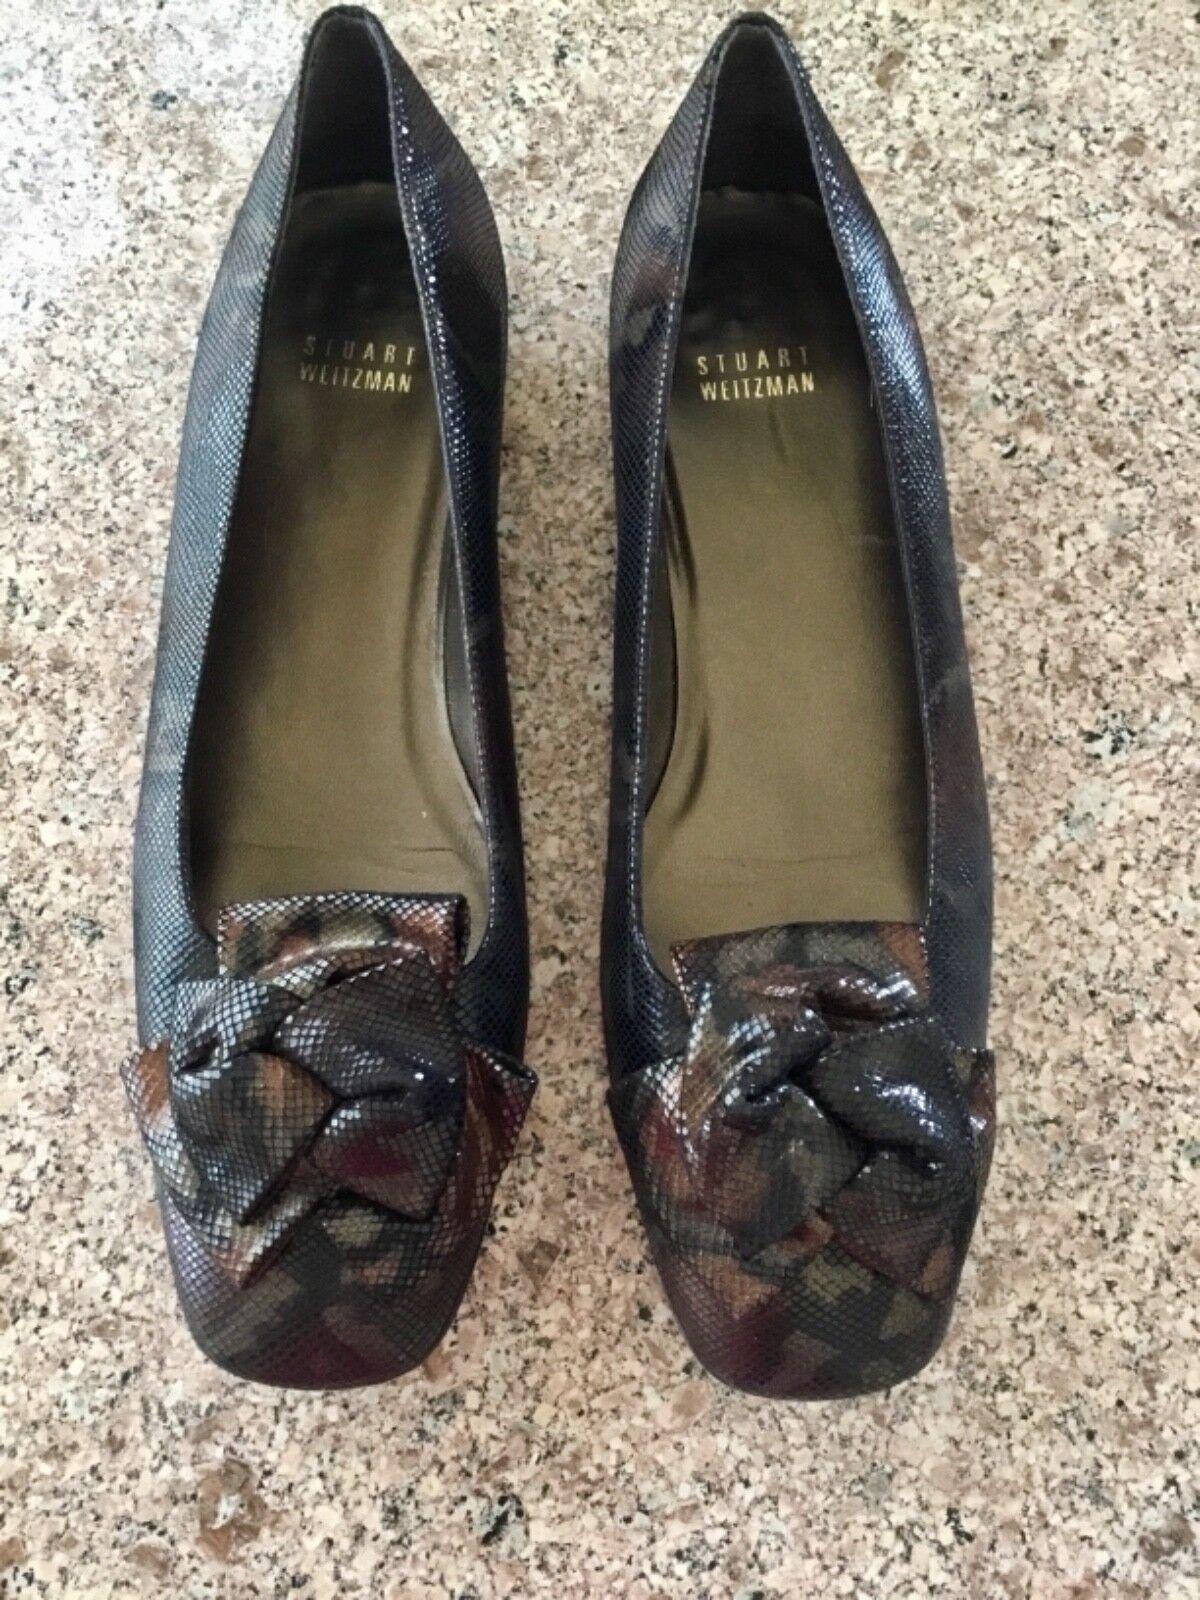 Classic Stuart Weitzman Braun Shimmer Snakeskin Bow Front Loafer Flats Sz 9 M